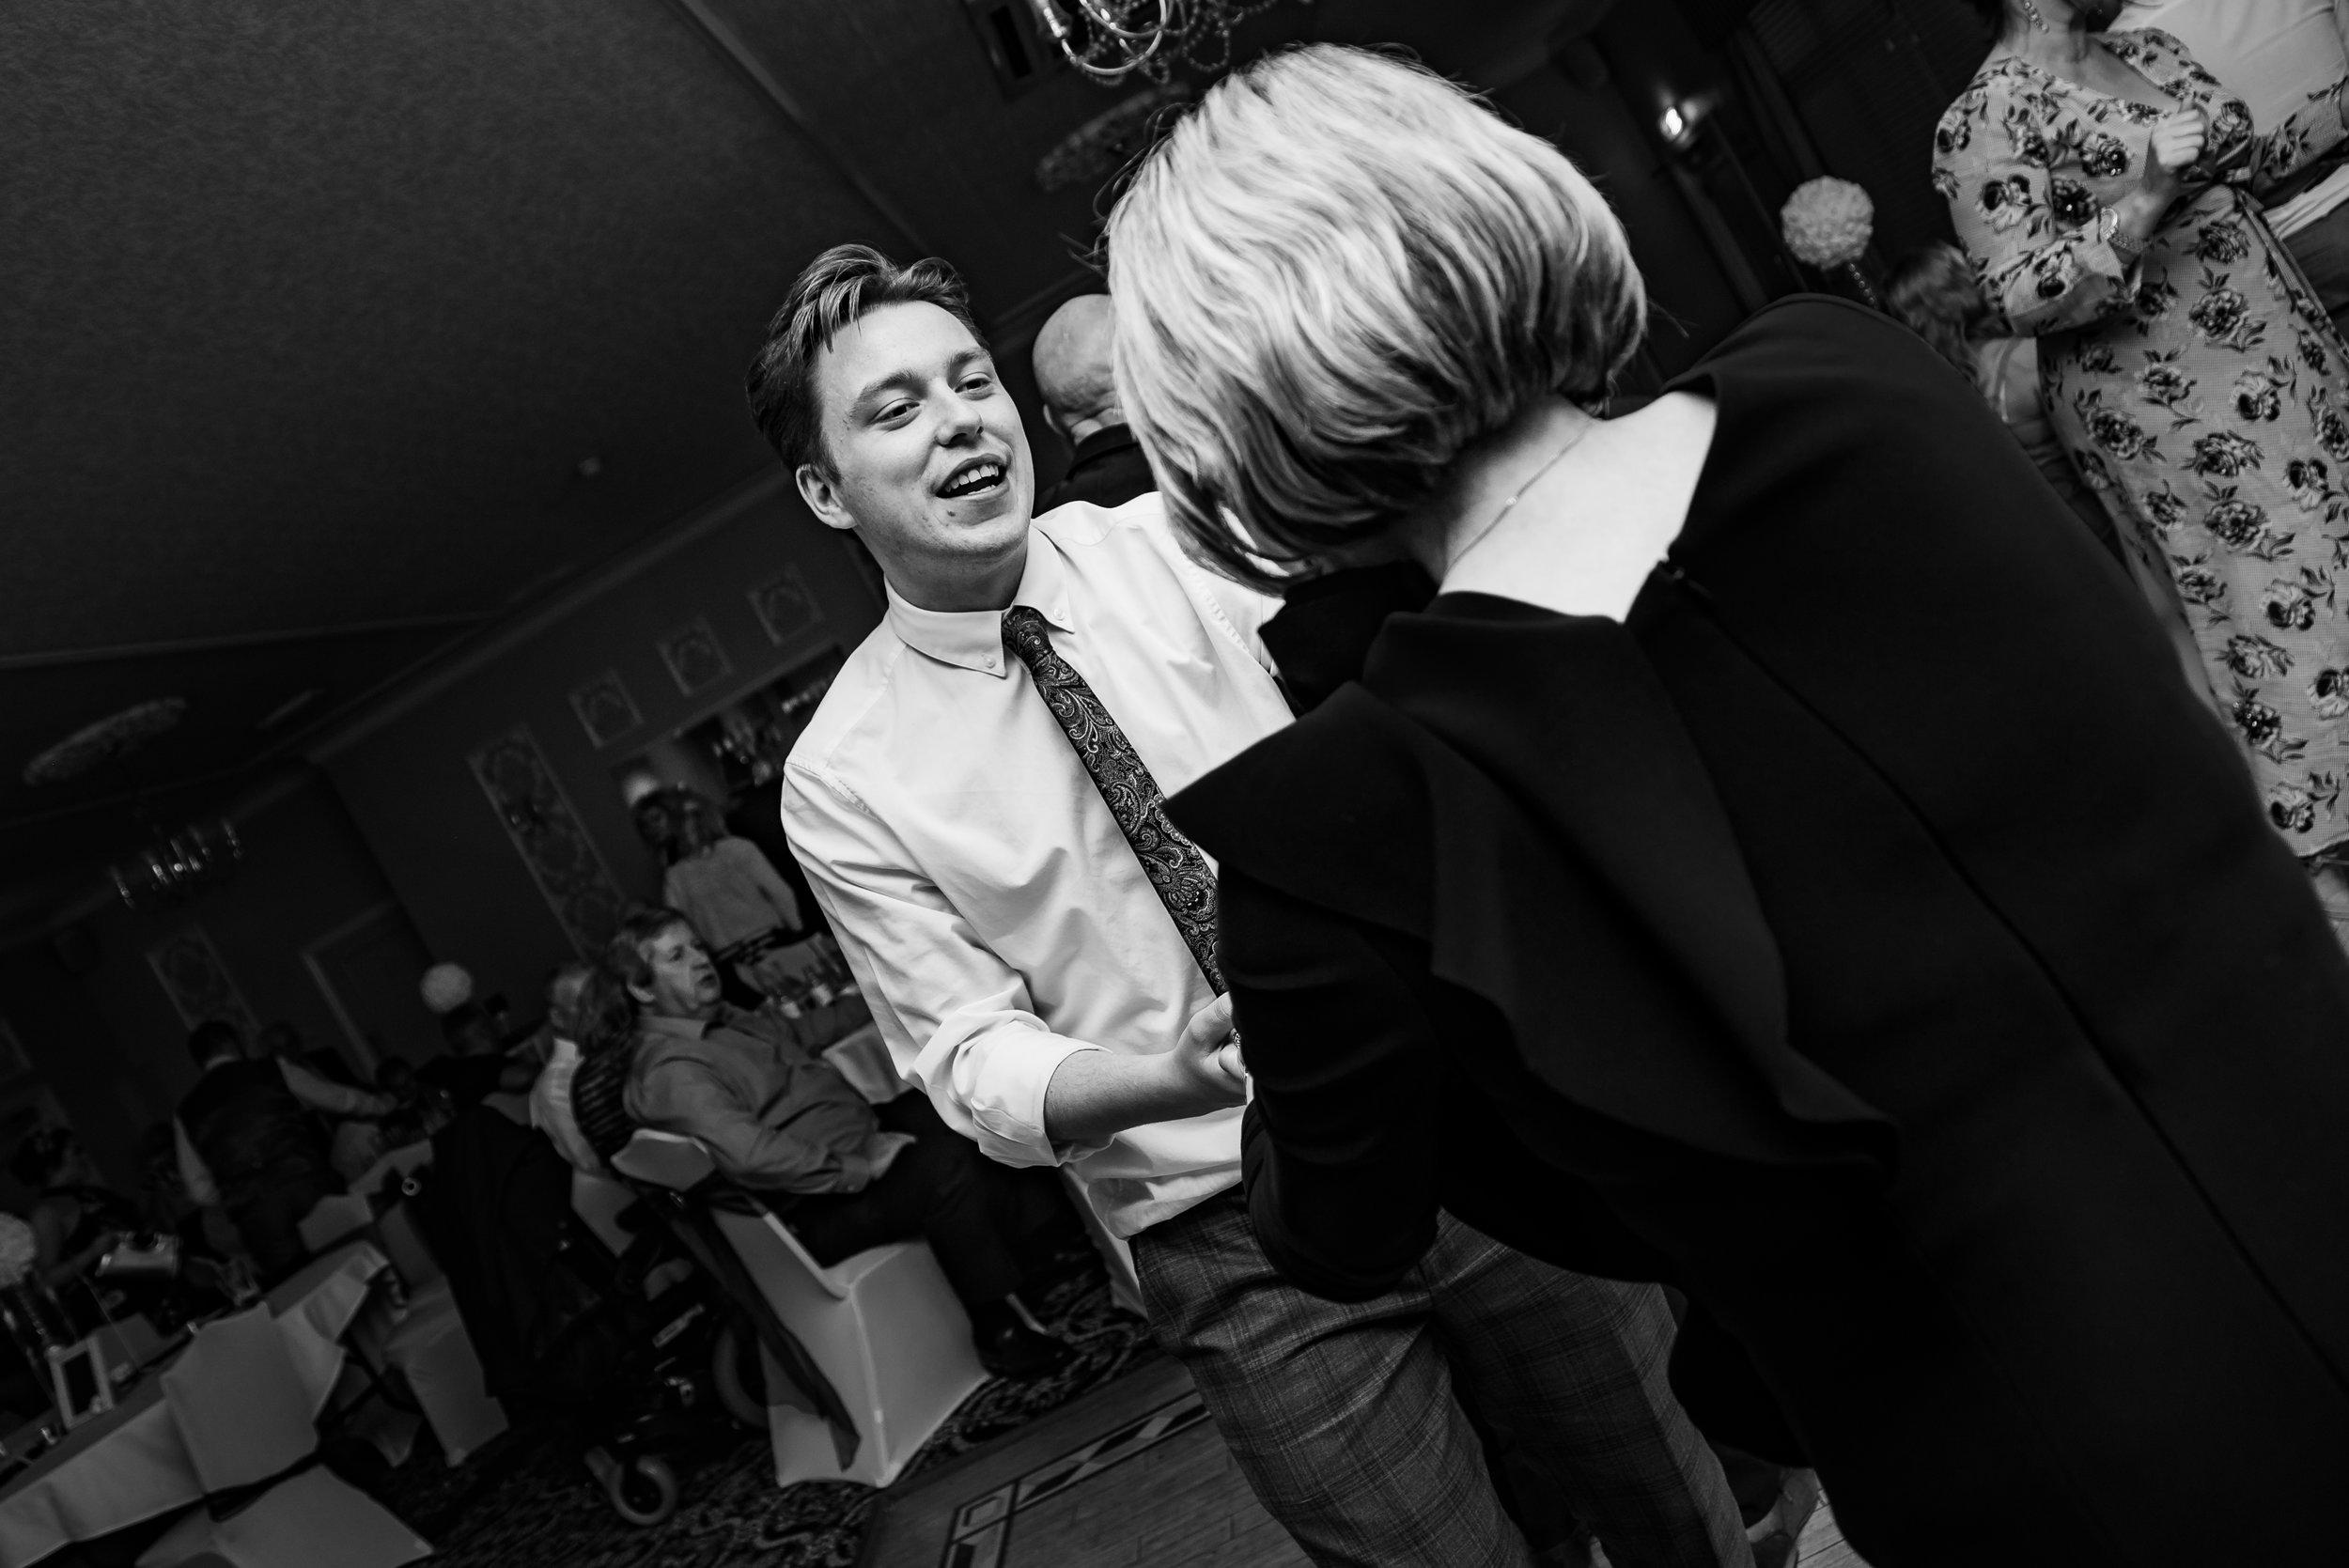 wedding photography show us them moves dana lewis